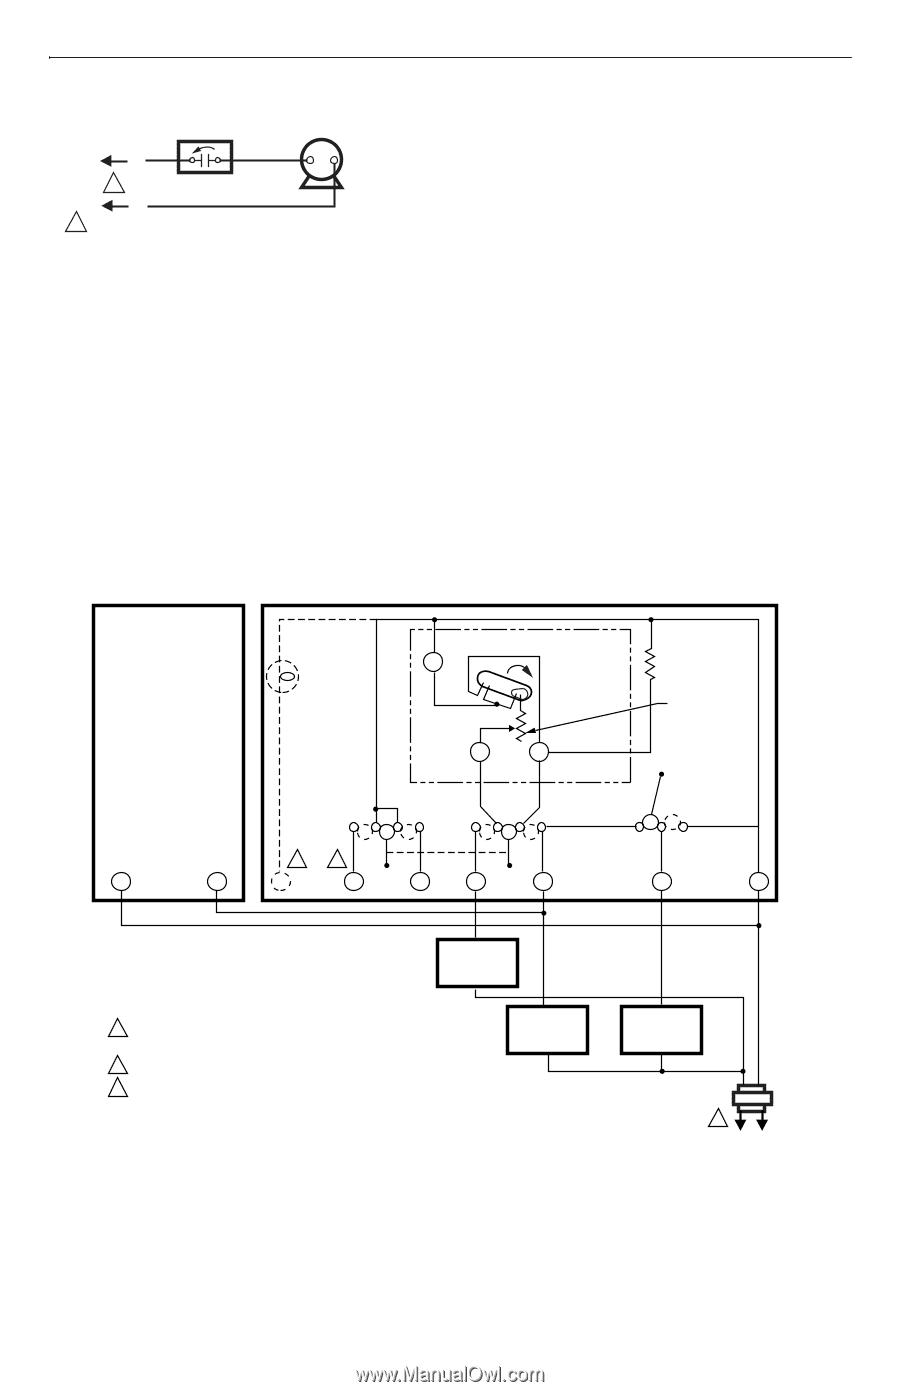 honeywell dehumidifier wiring diagram